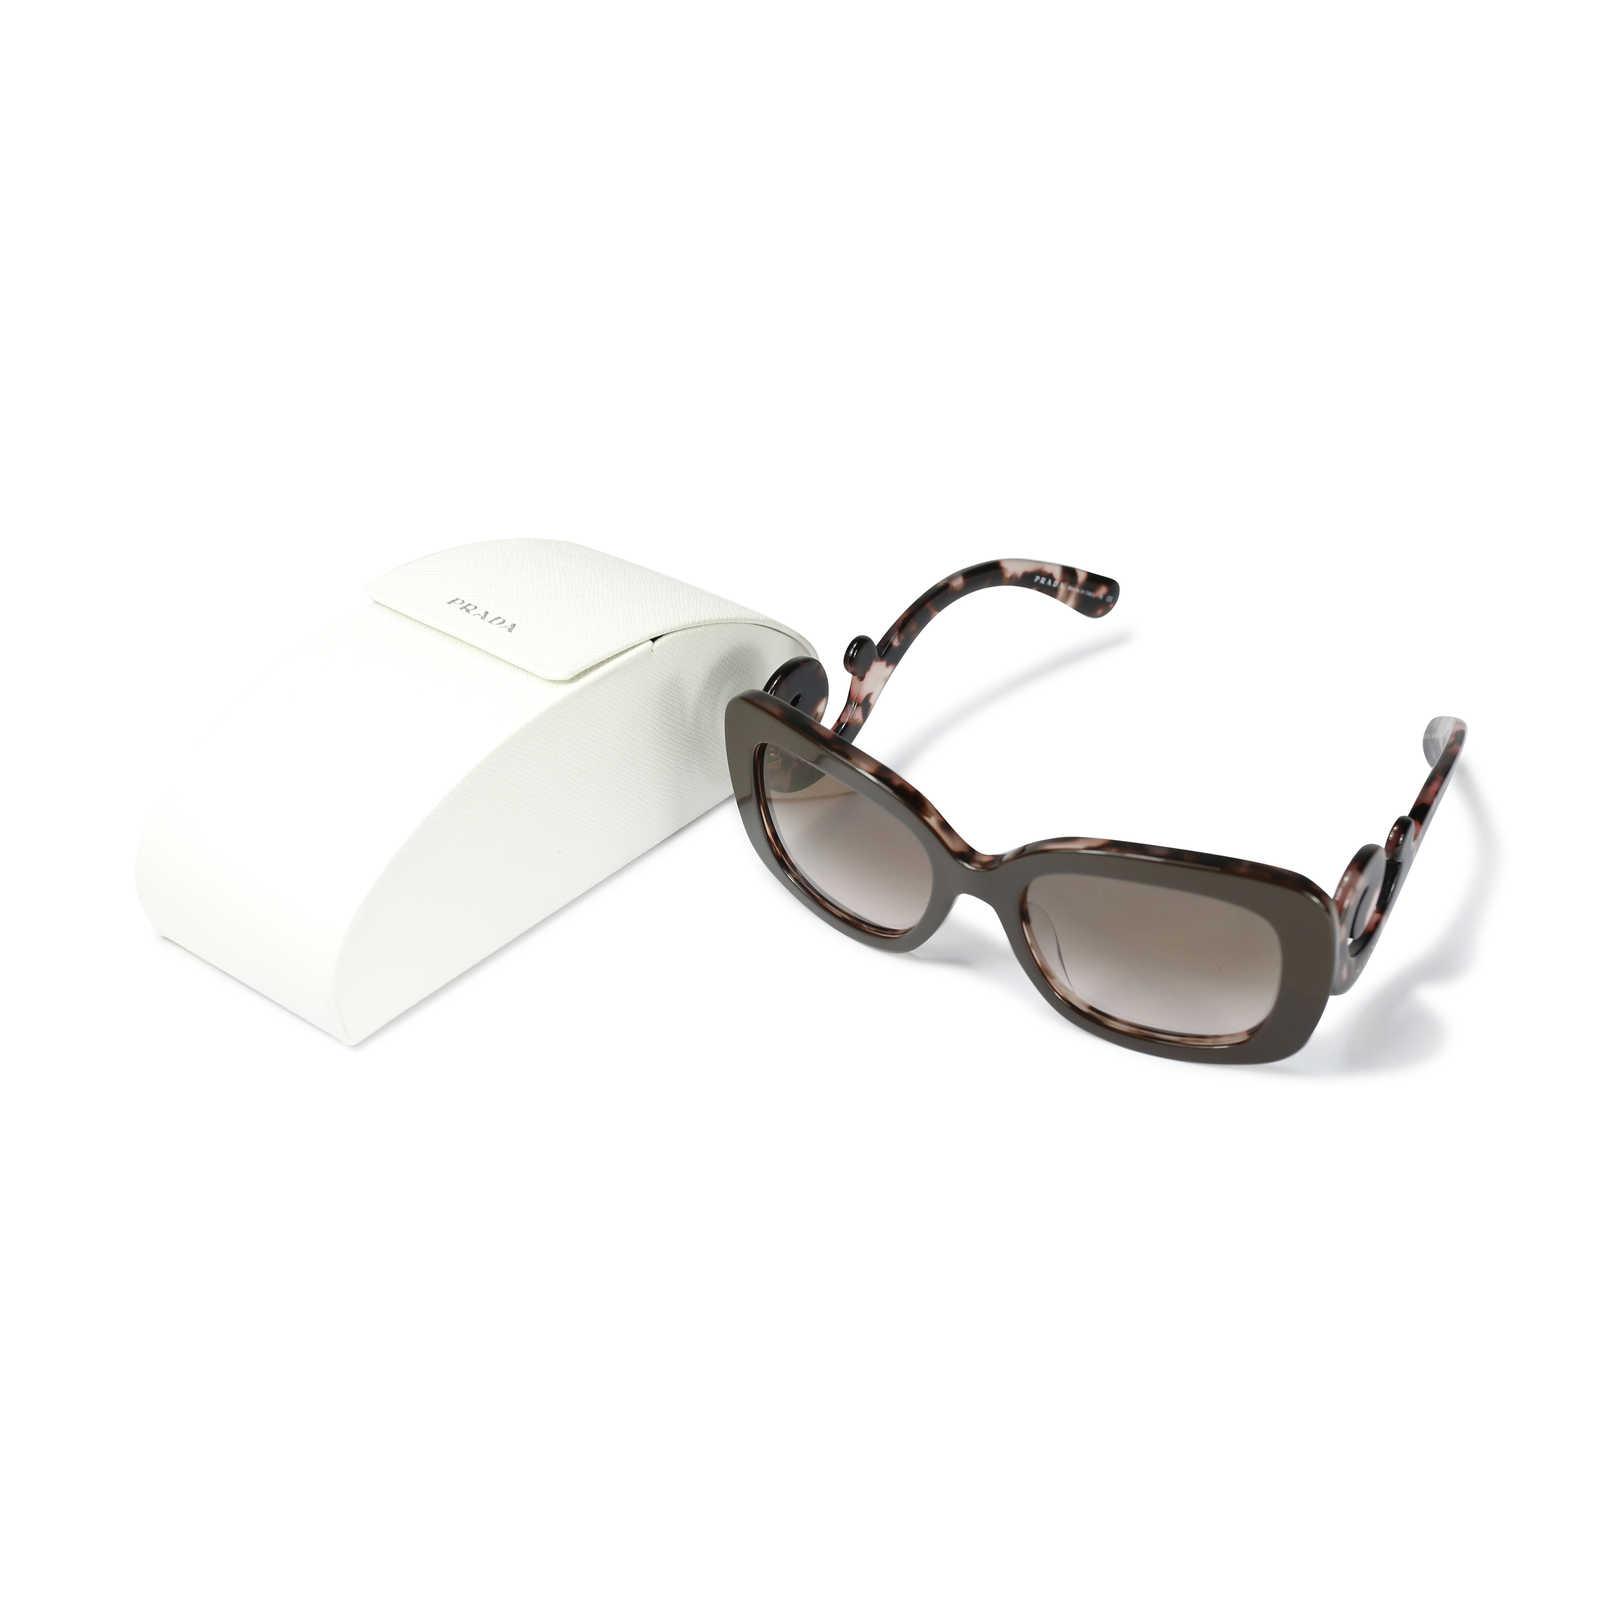 d094d56914 Prada Baroque Sunglasses Sale